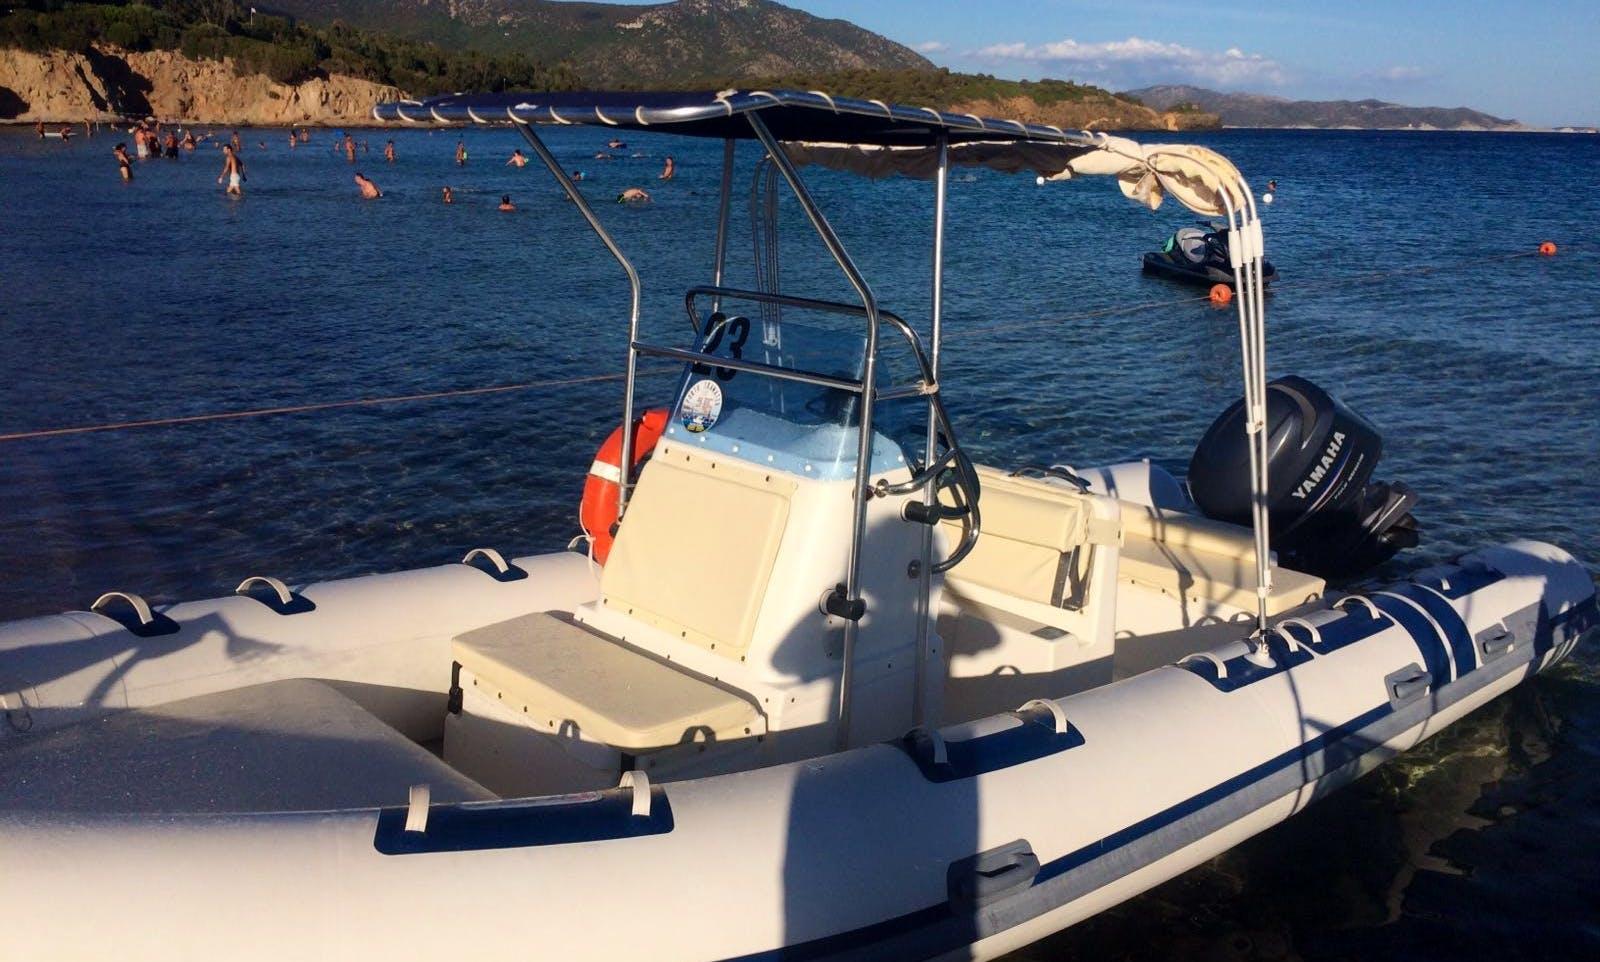 Rent 23' North Star Rigid Inflatable Boat in Teulada, Sardegna